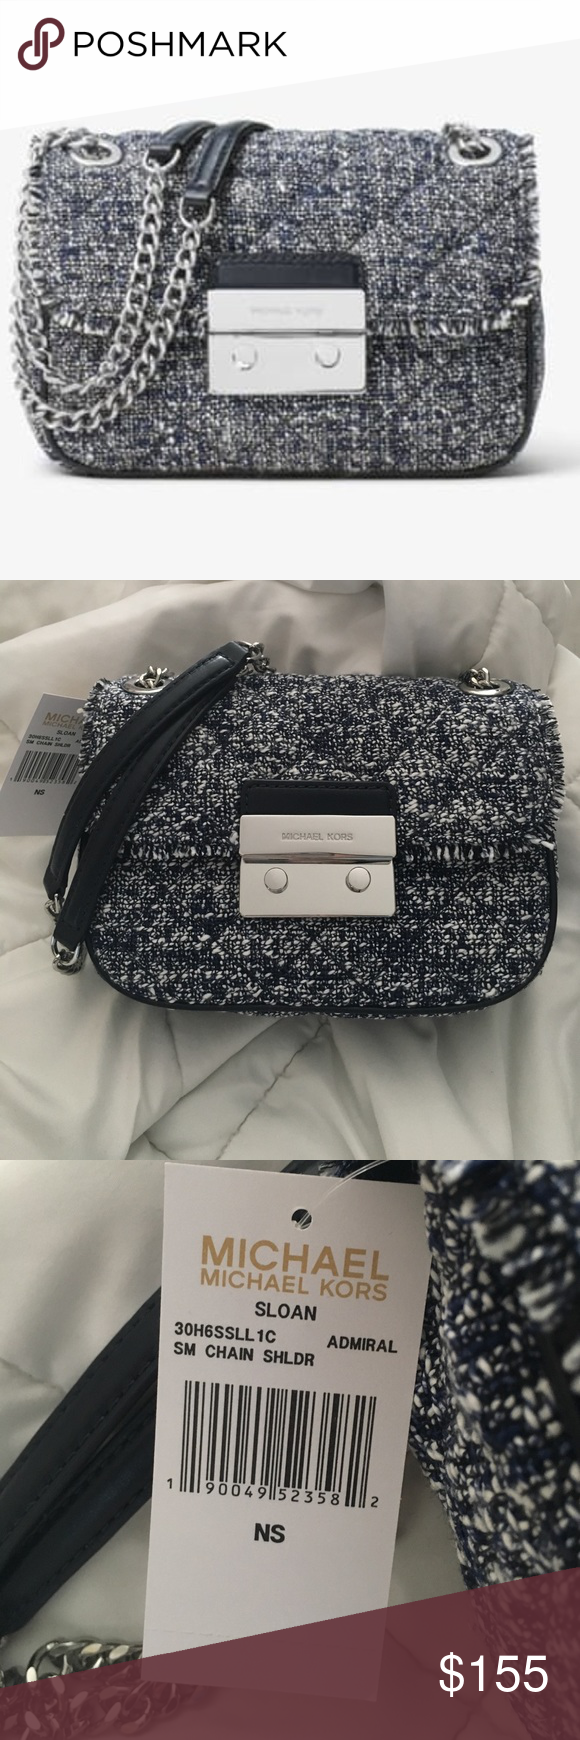 919b9b3c8571 MK Small Sloan Tweed Crossbody New, so cute!! Is no longer in stock! Feel  free to make an offer! Michael Kors Bags Crossbody Bags